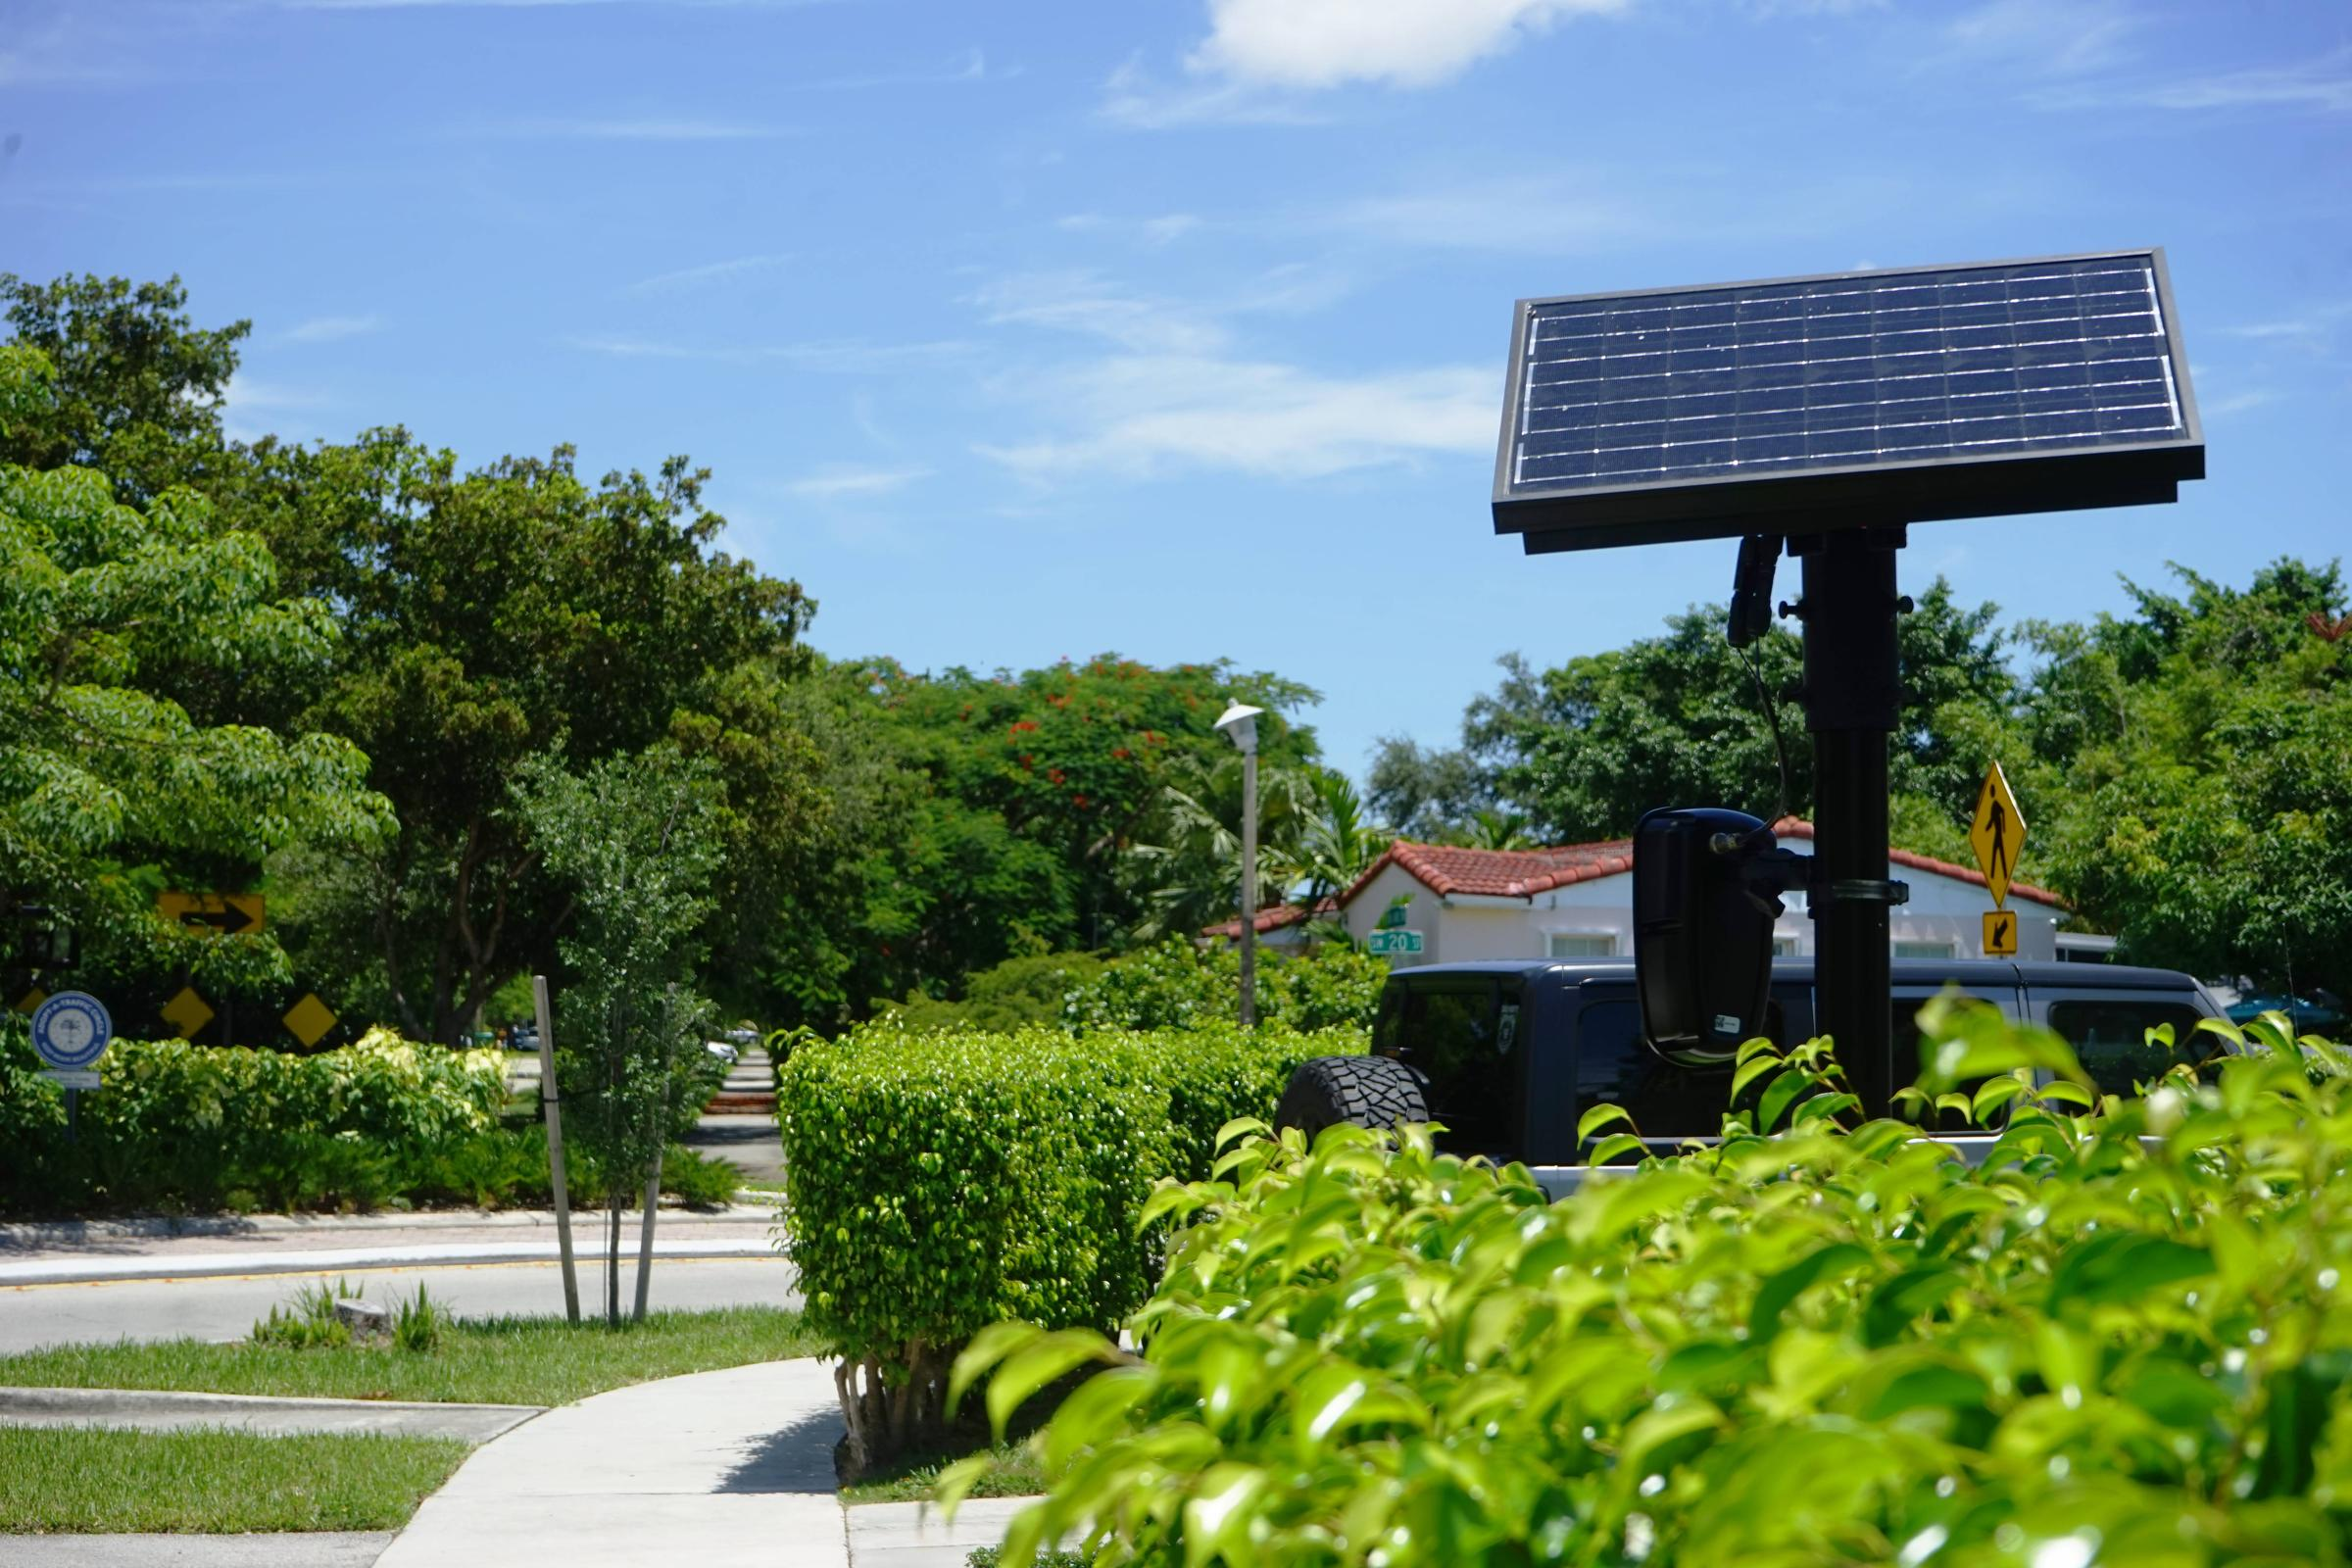 A Miami Neighborhood Divided Over Unregulated Surveillance